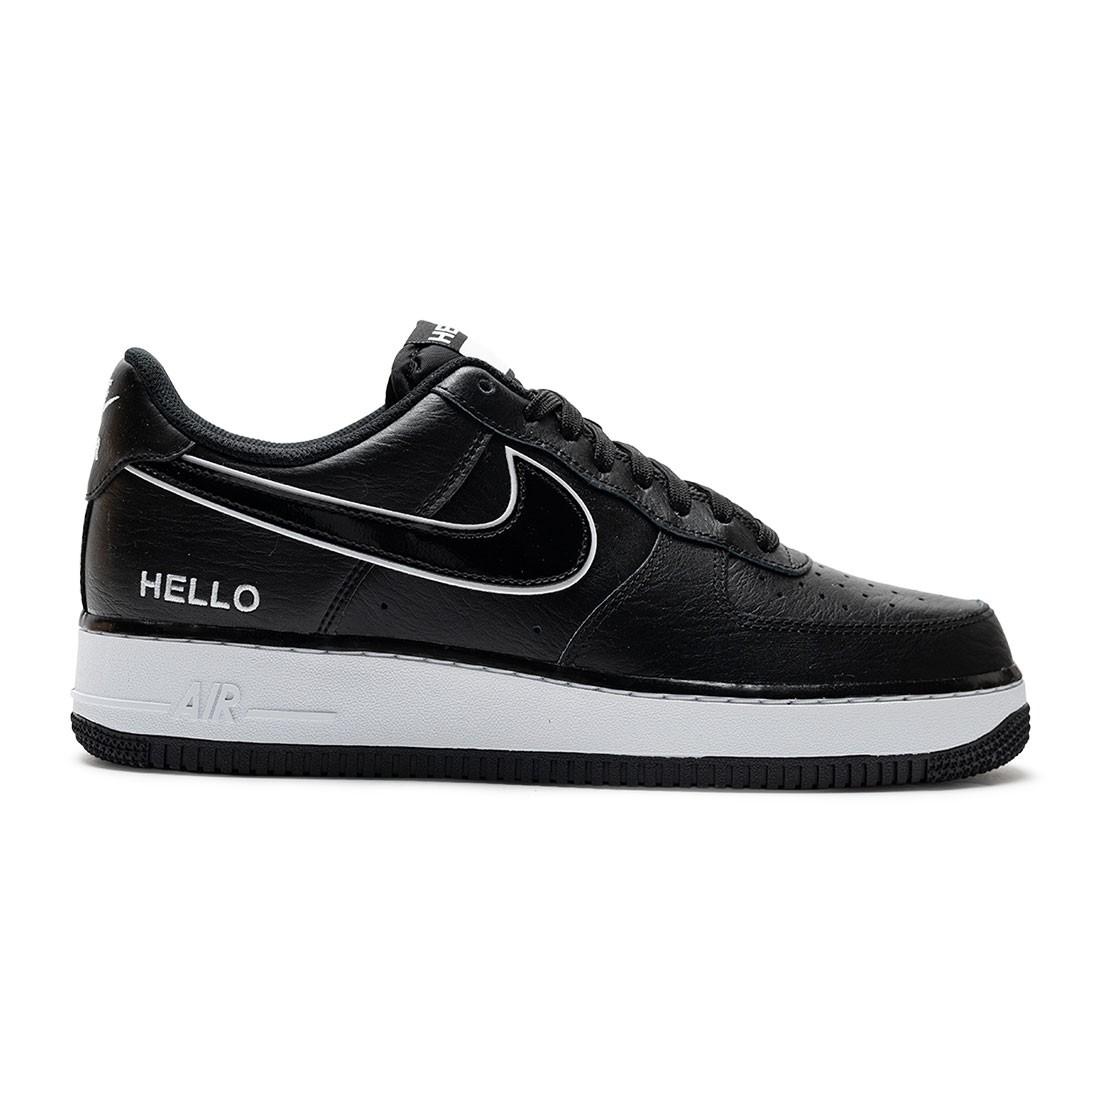 Nike Men Air Force 1 '07 Lx (black / black-white)